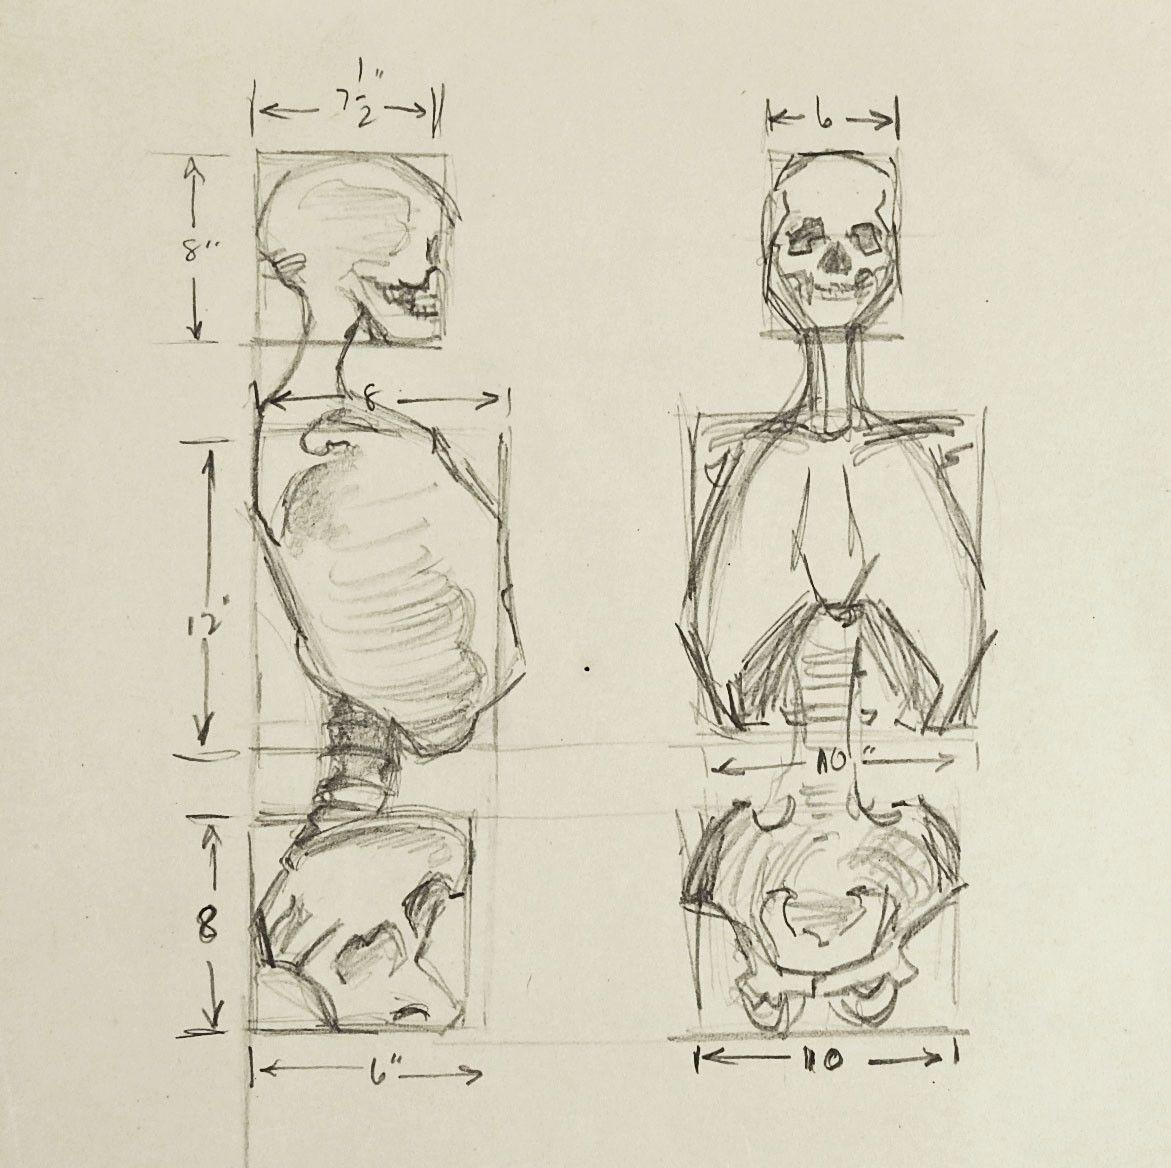 Anatomy Skeleton Study Drawing | Anatomía, Dibujo y Dibujar